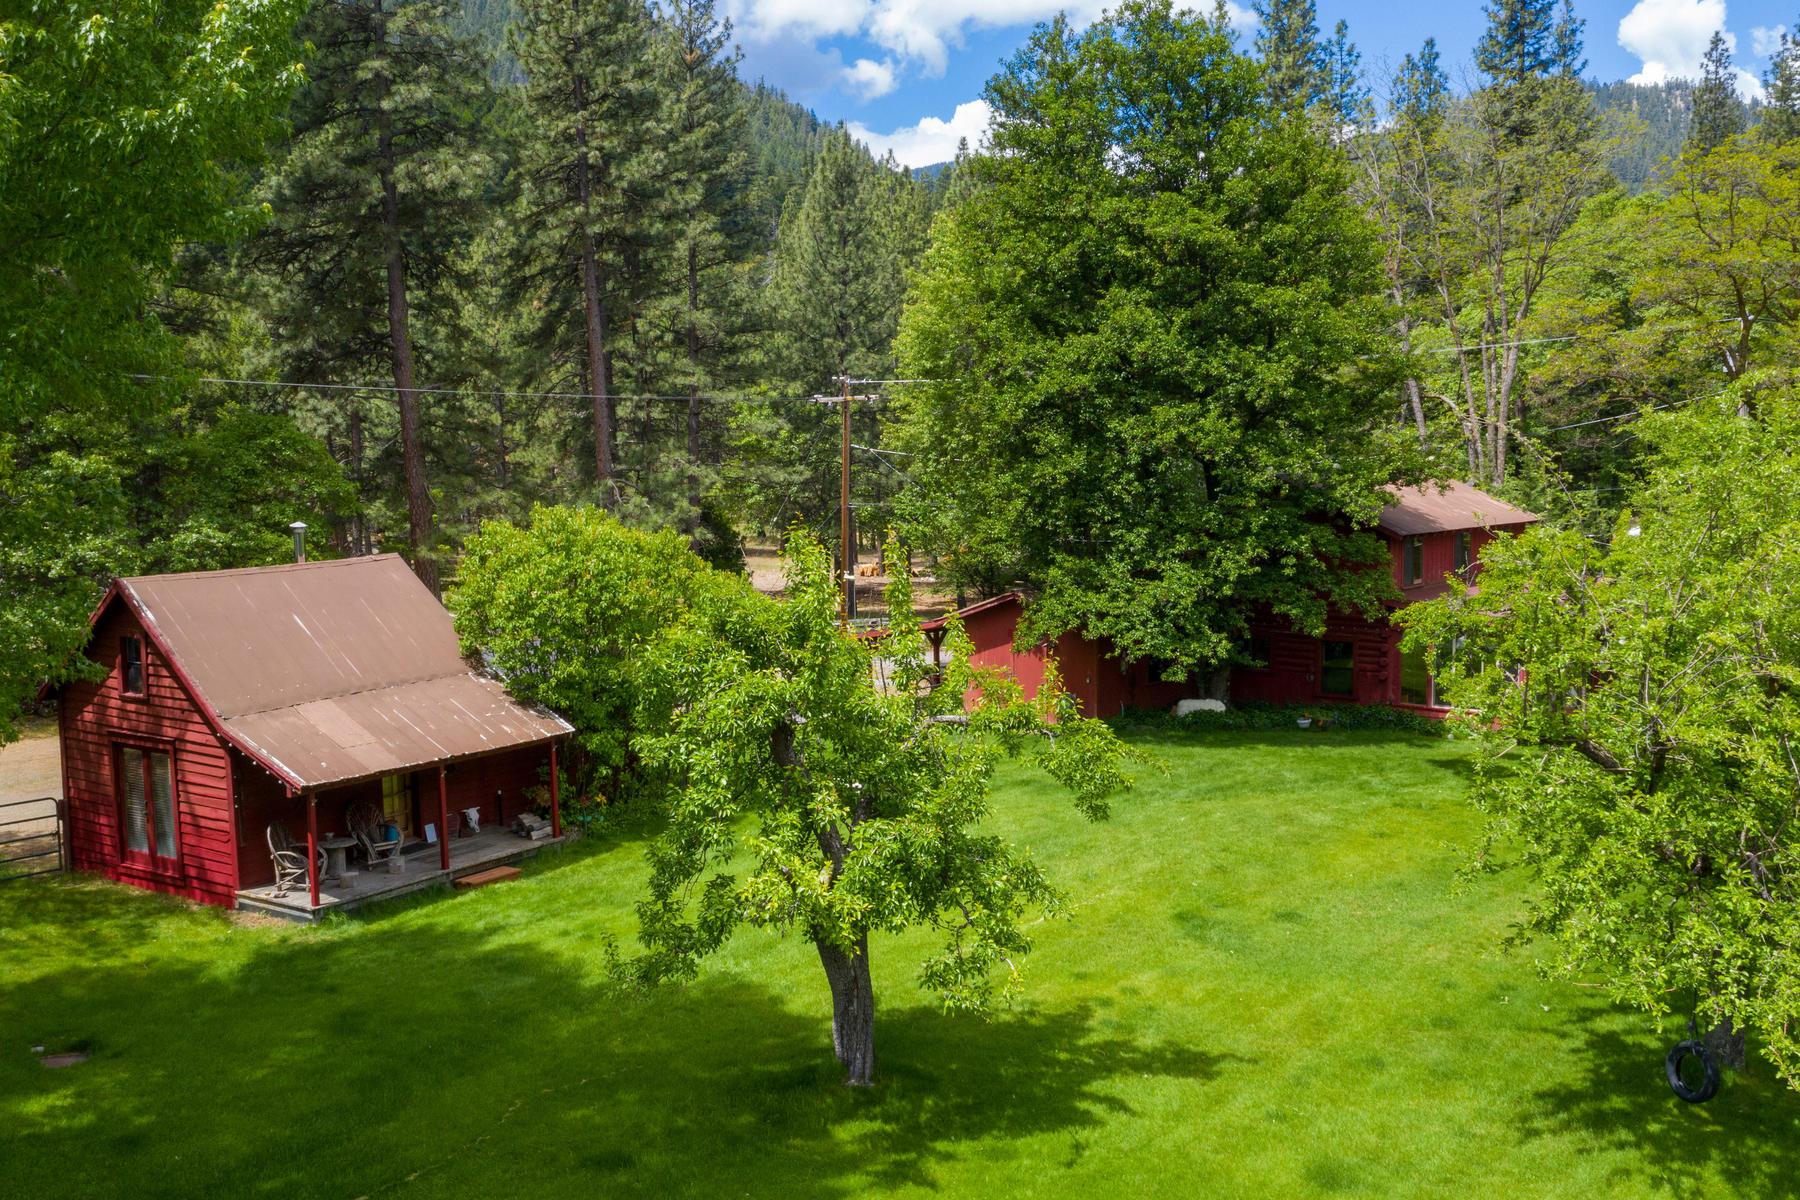 Additional photo for property listing at 2891 Genesee Rd. Taylorsville, CA 95983 2891 Genesee Rd. Taylorsville, California 95983 Estados Unidos